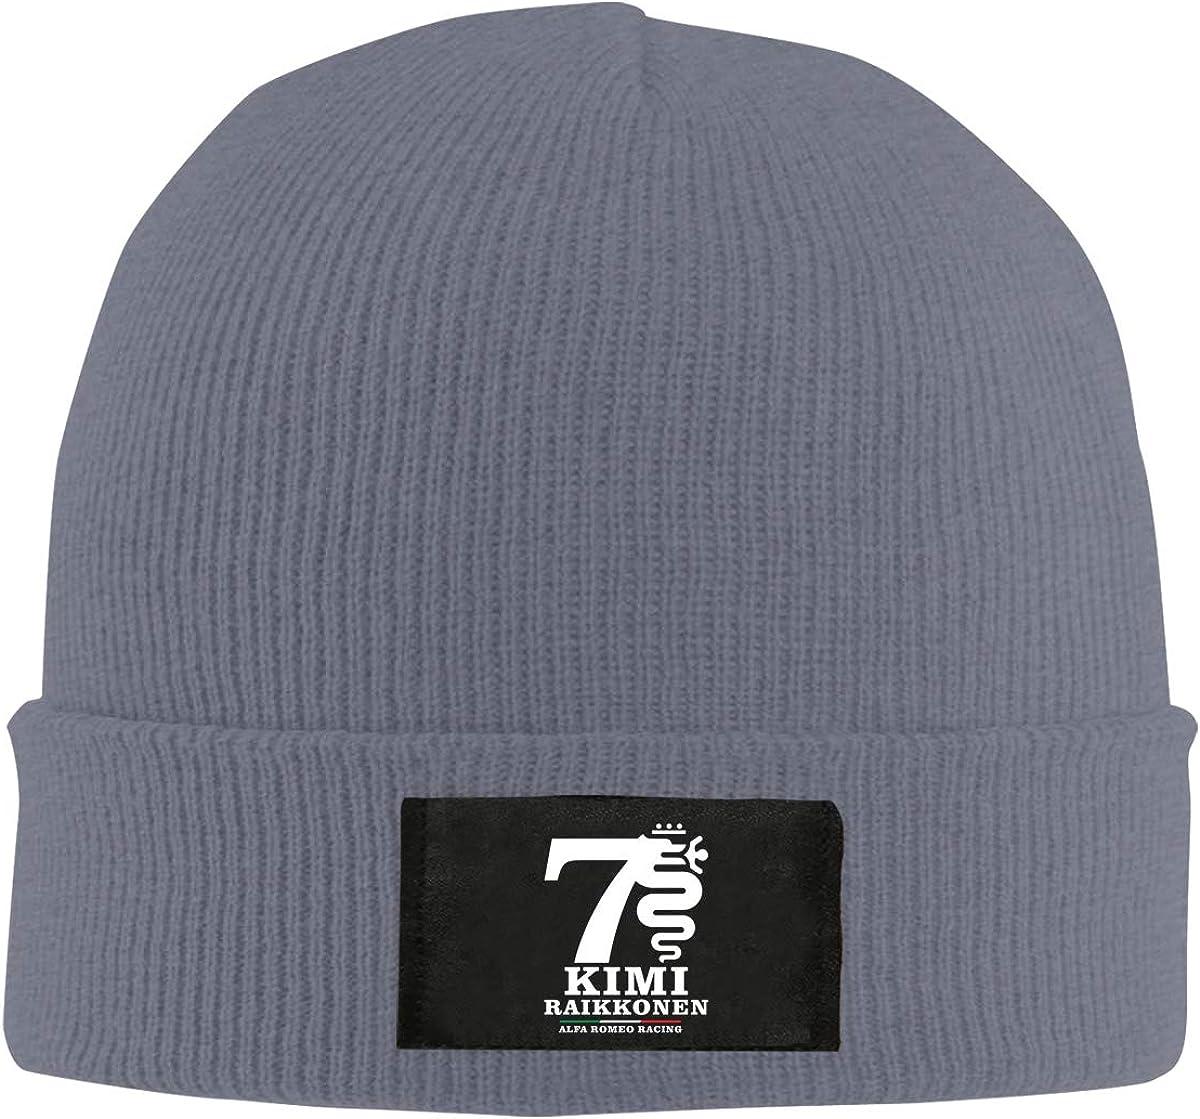 TIMMEAGE Kimi Raikkonen Alfa Romeo Racing Knitting Hat Warm Winter Hedging Caps